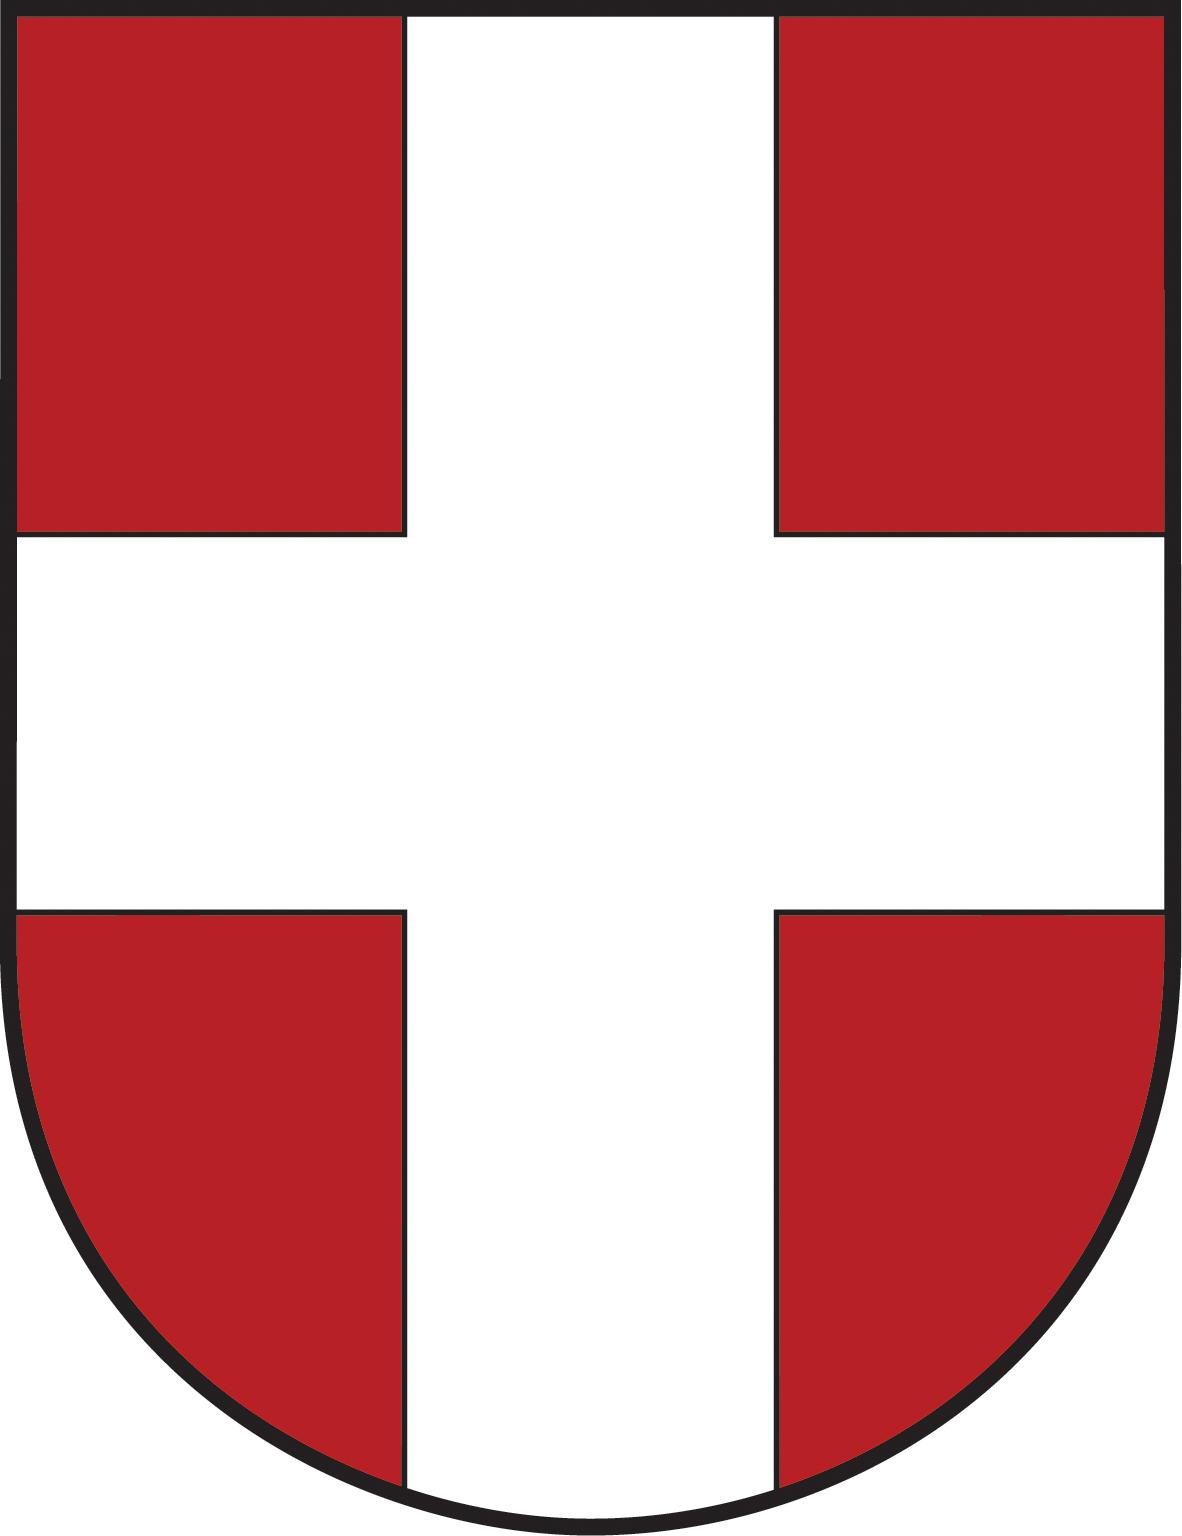 Das Wiener Wappen